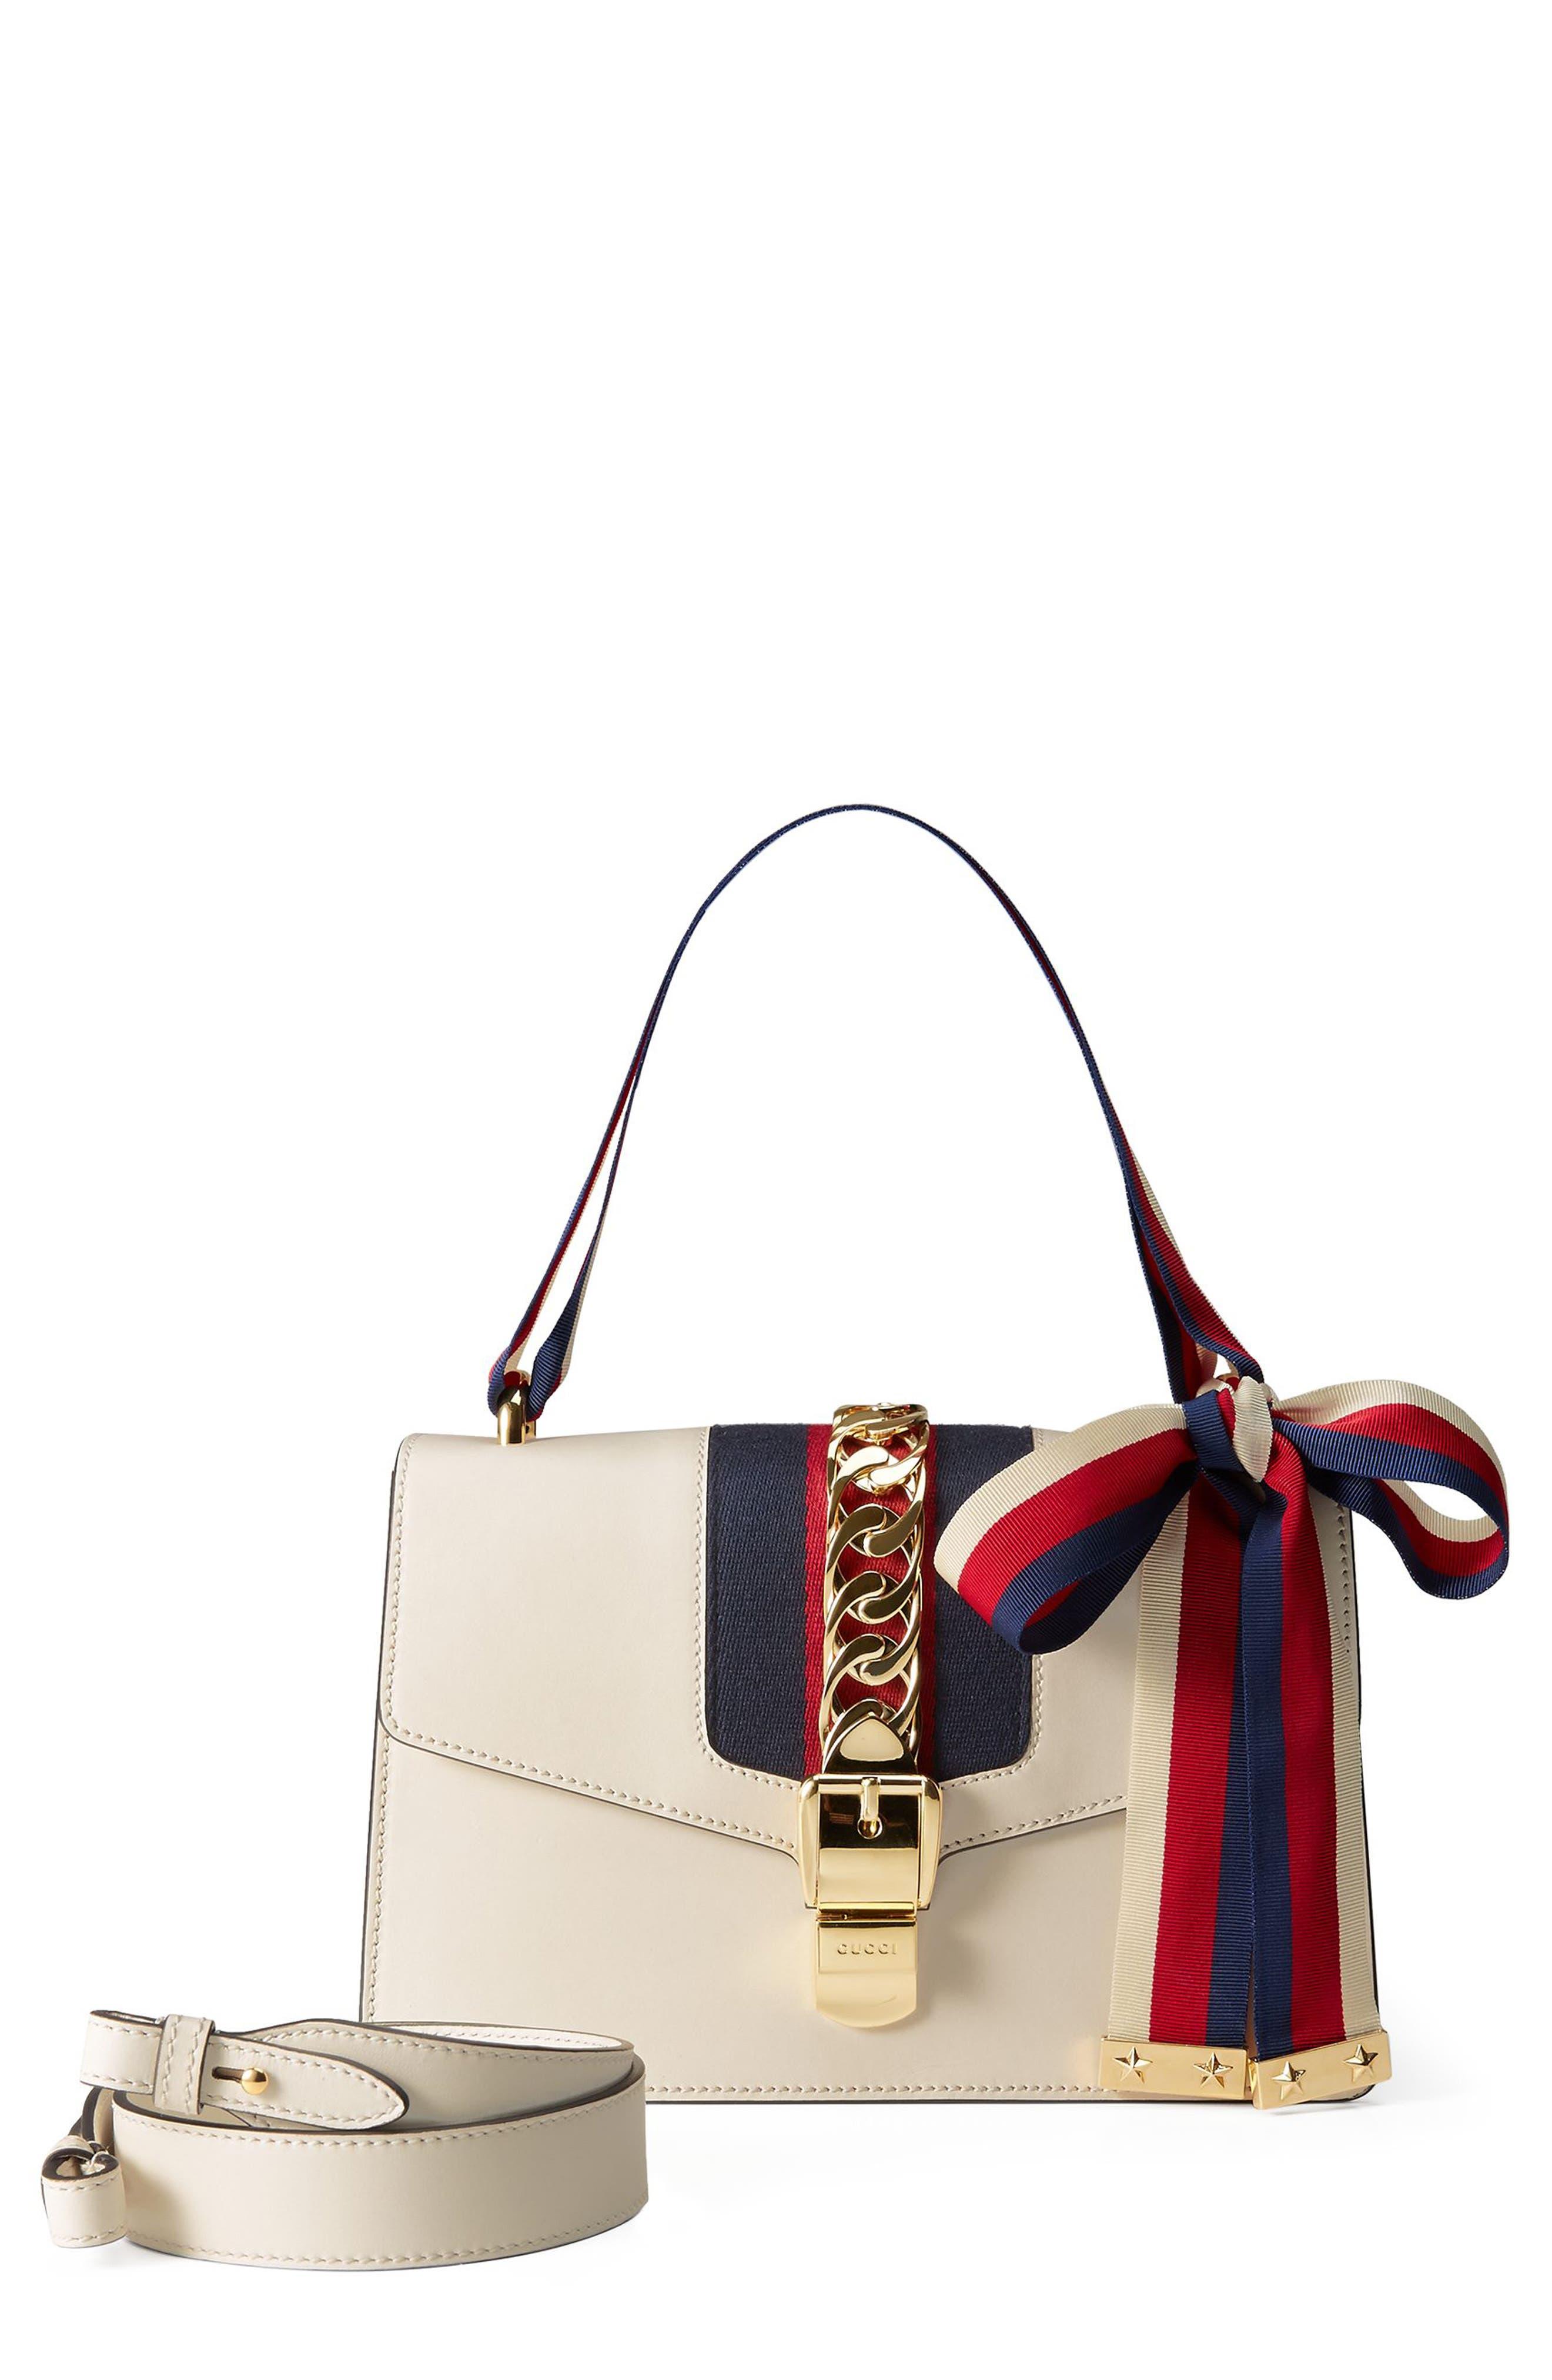 GUCCI, Small Sylvie Leather Shoulder Bag, Main thumbnail 1, color, WHITE